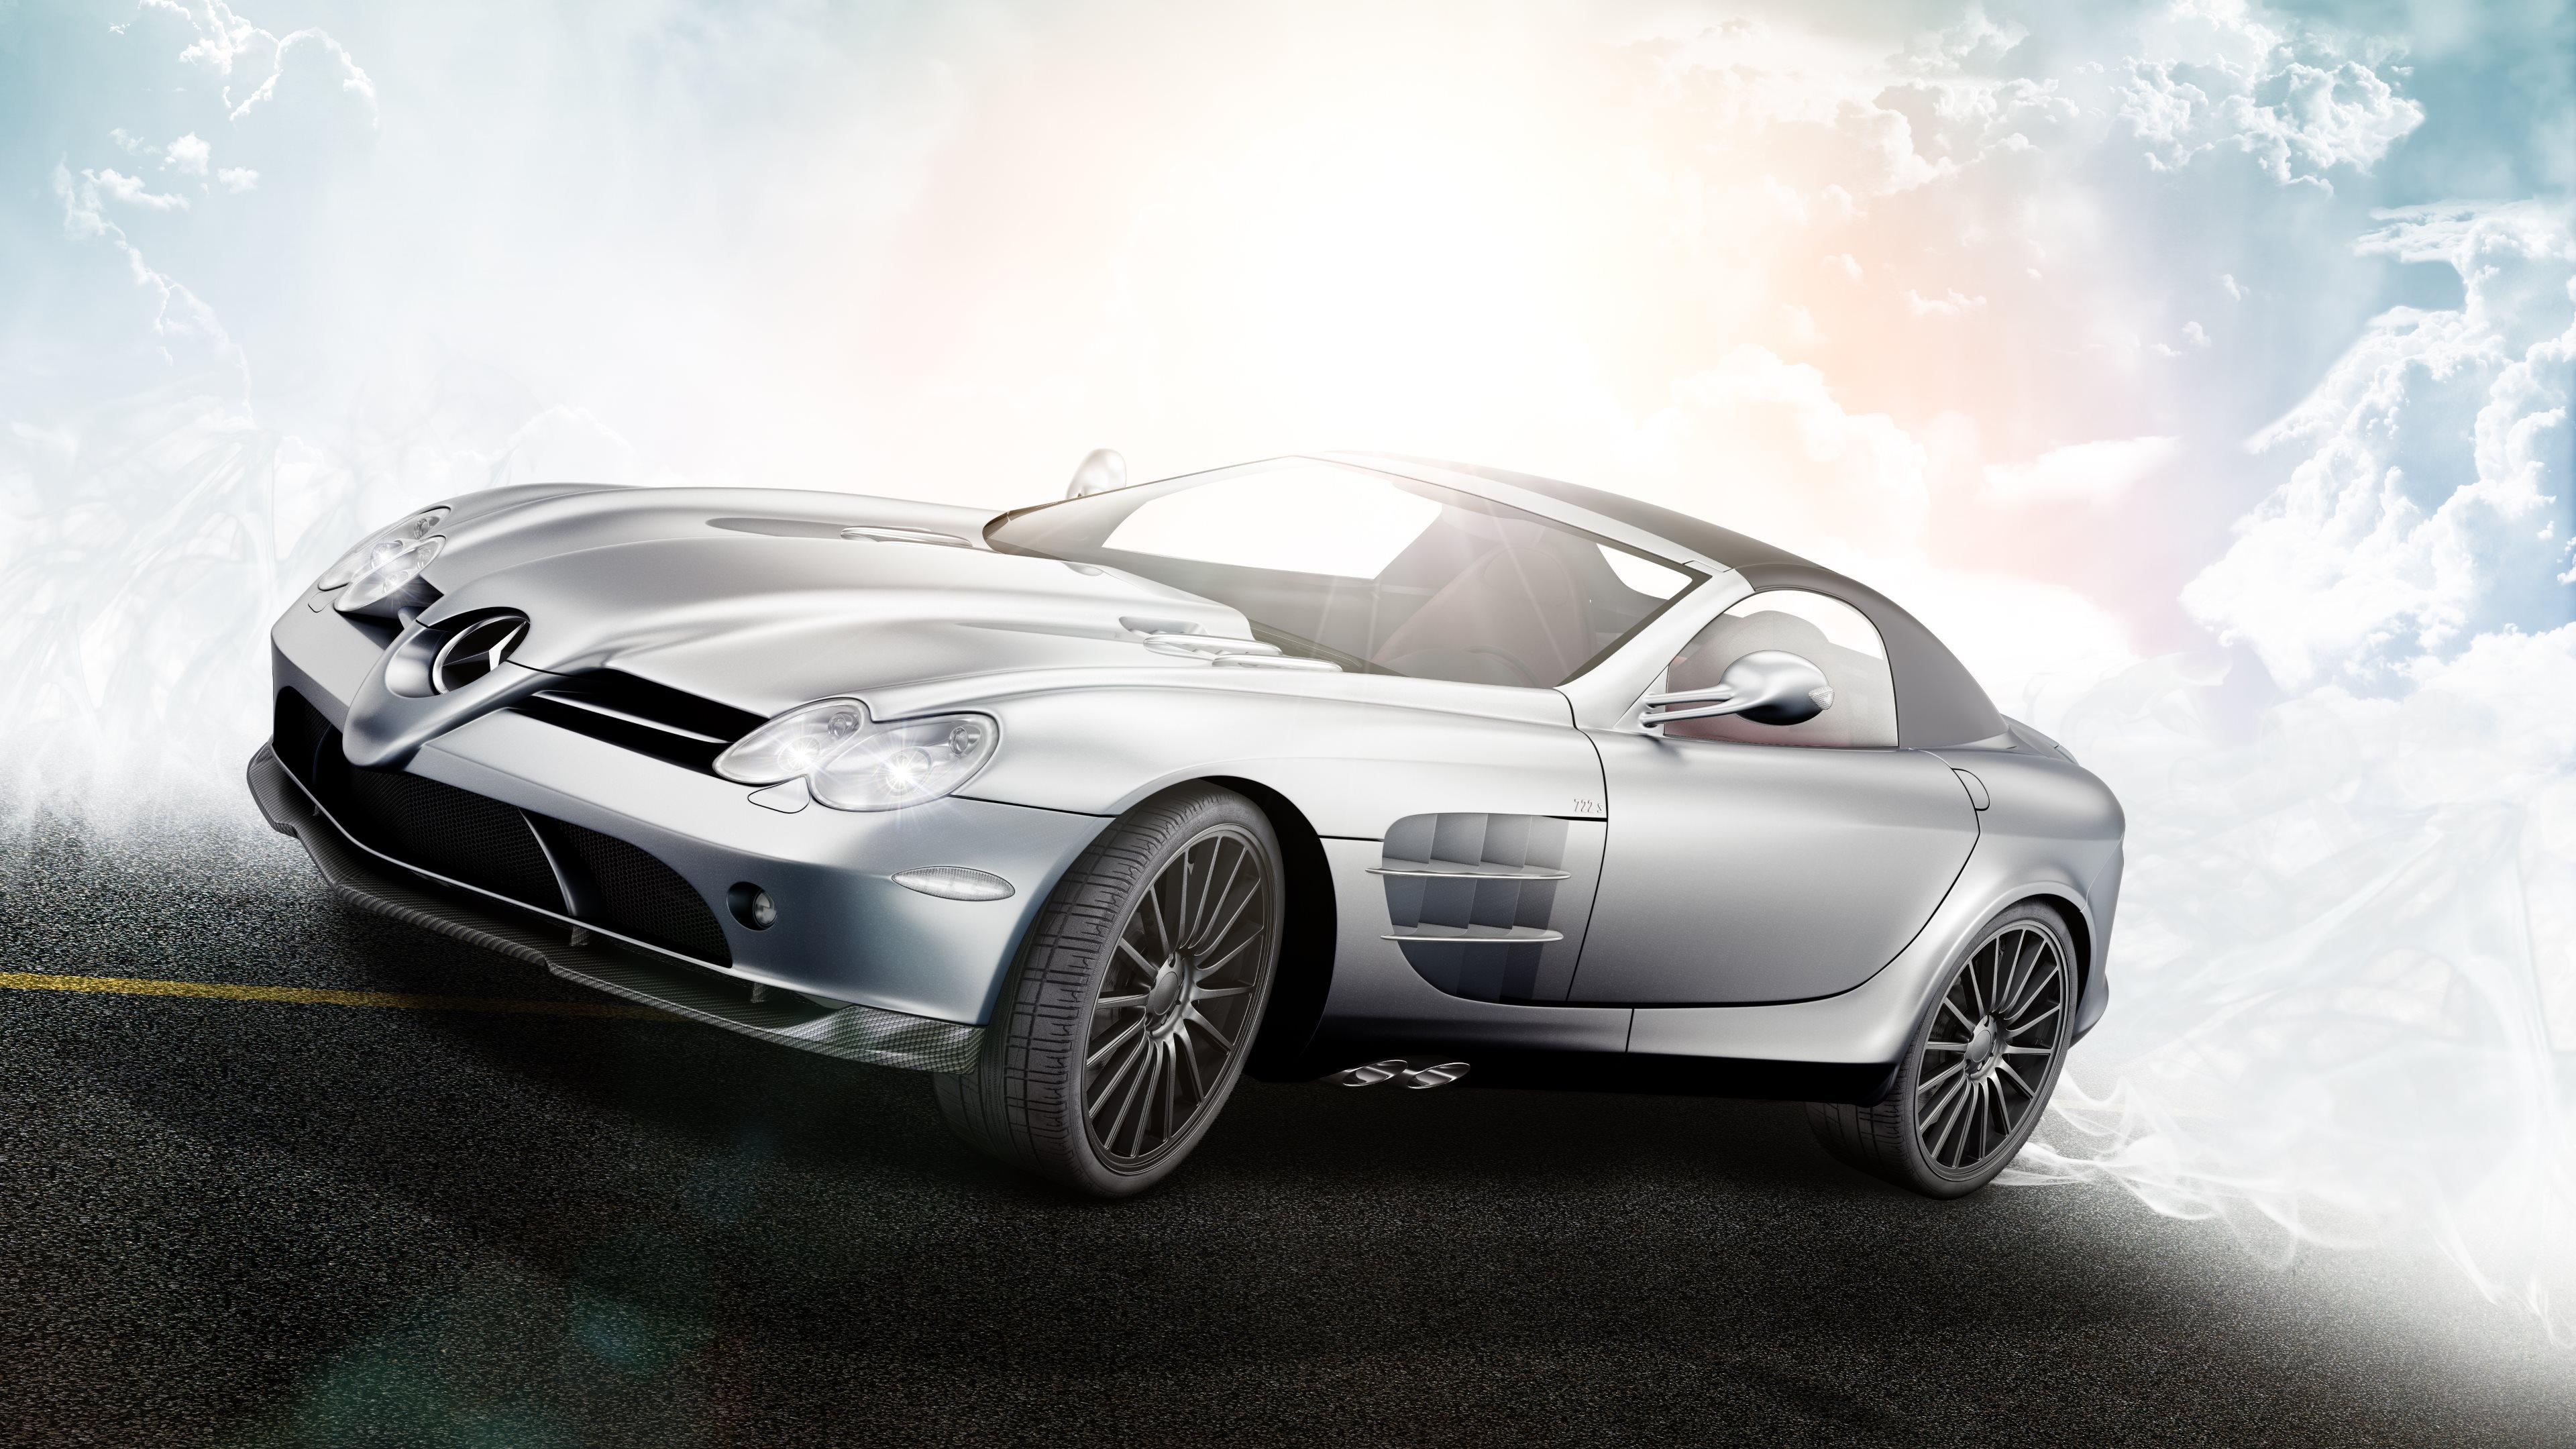 Mercedes benz mclaren slr 722 s 4k wallpapers for Mercedes benz slr mclaren